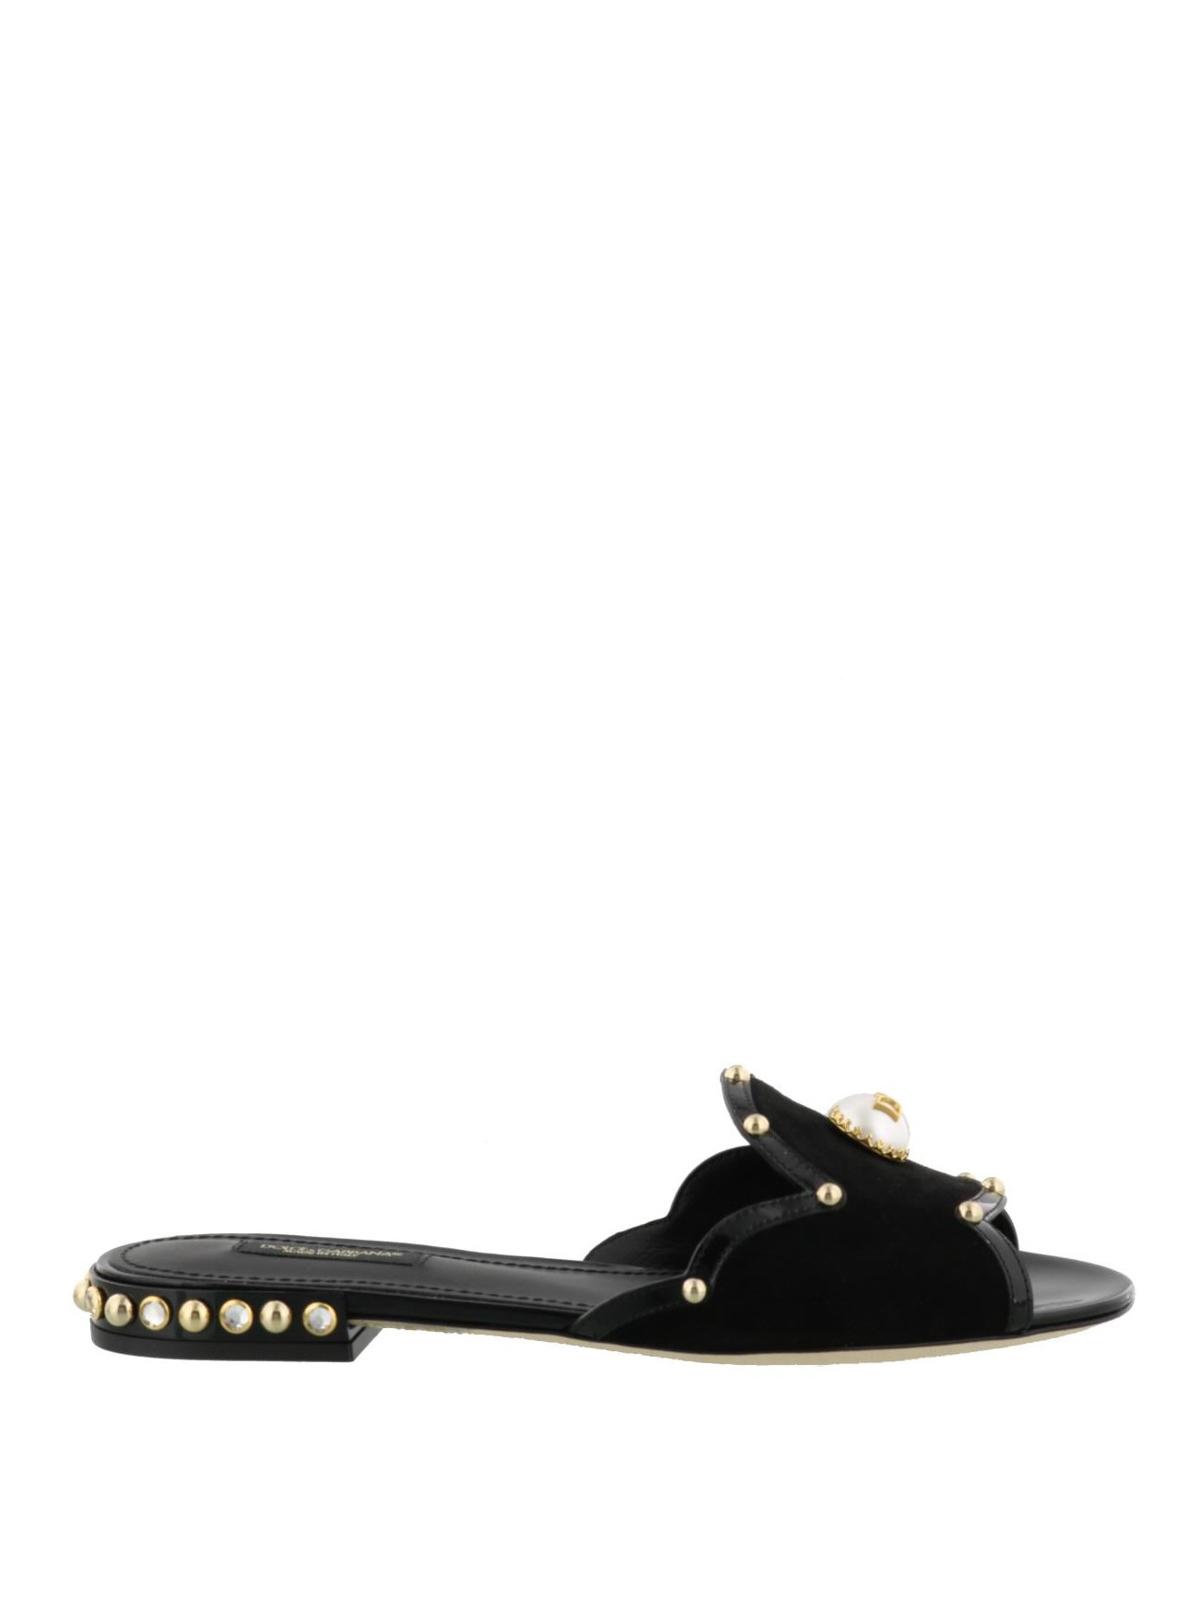 Dolce \u0026 Gabbana - Embellished open toe